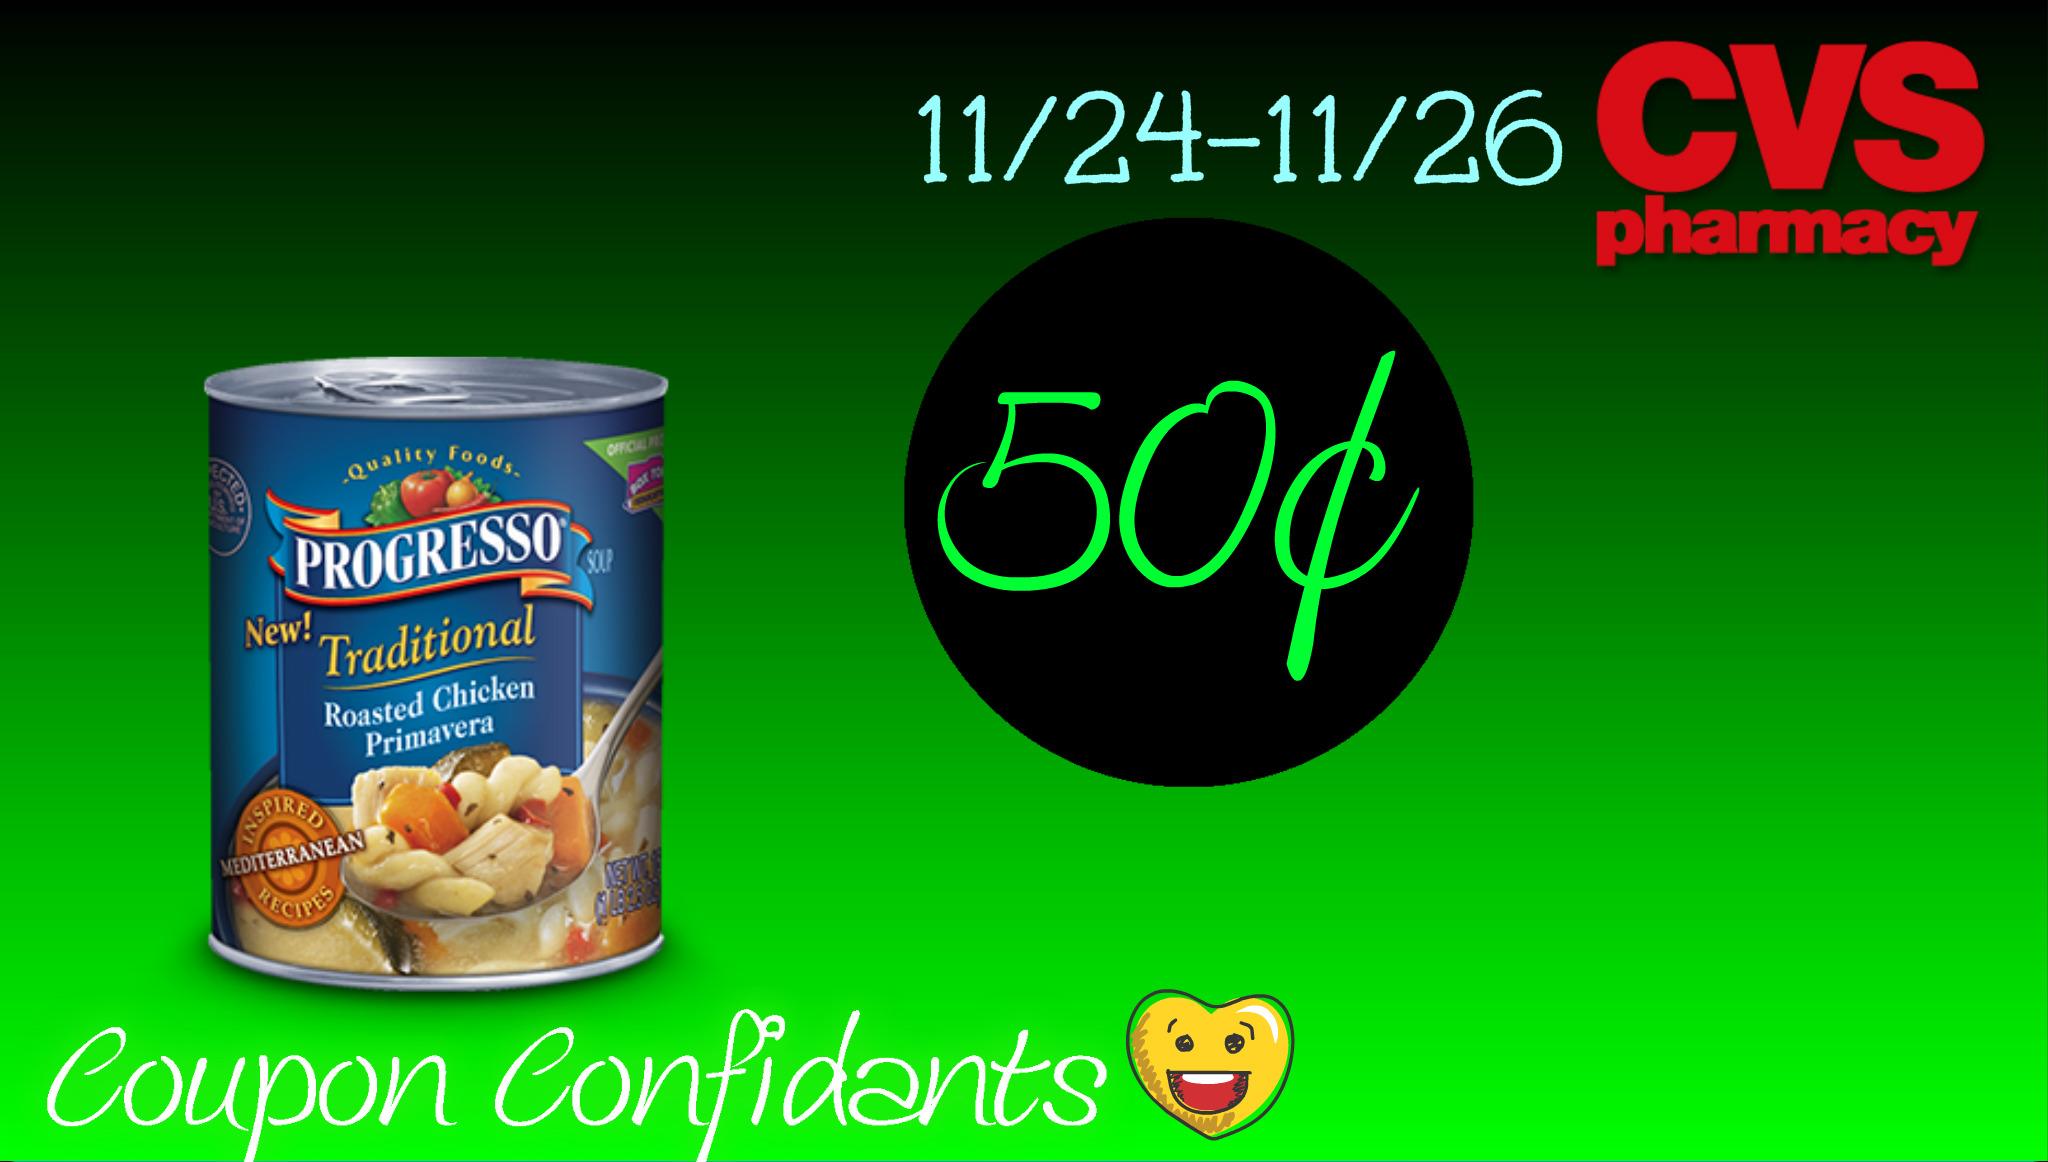 HOT deal for HOT Soup - Progresso Soup at CVS!